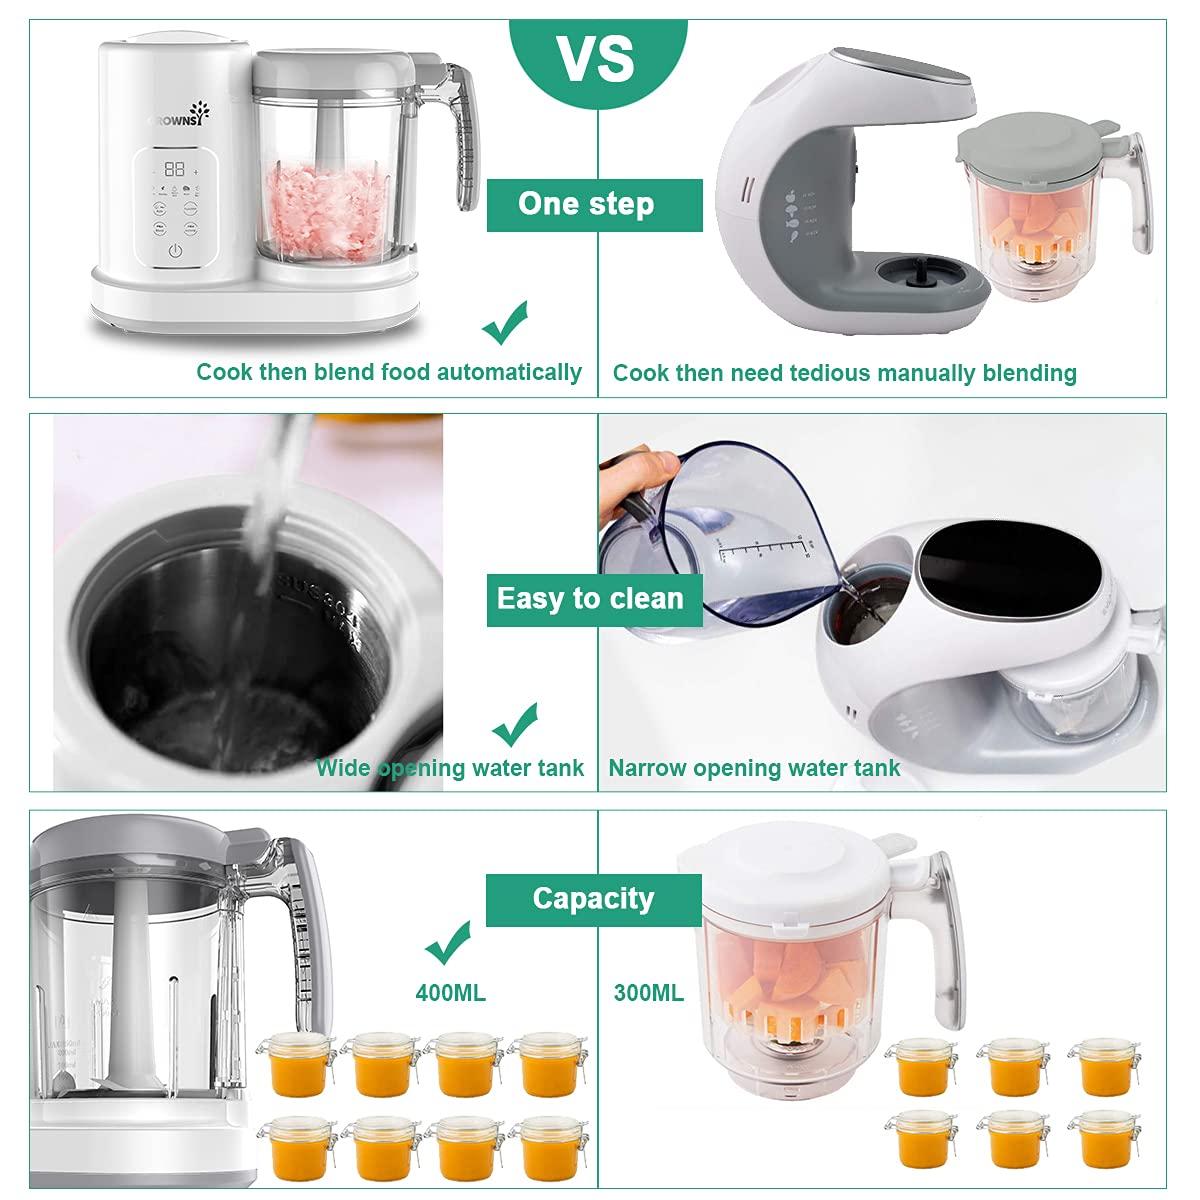 Baby Food Maker | Baby food Processor | Puree Blender Multi-Function Steamer Grinder Blender, Baby Food Warmer Mills Machine, Constant Temperature 24H, Auto Cooking & Grinding